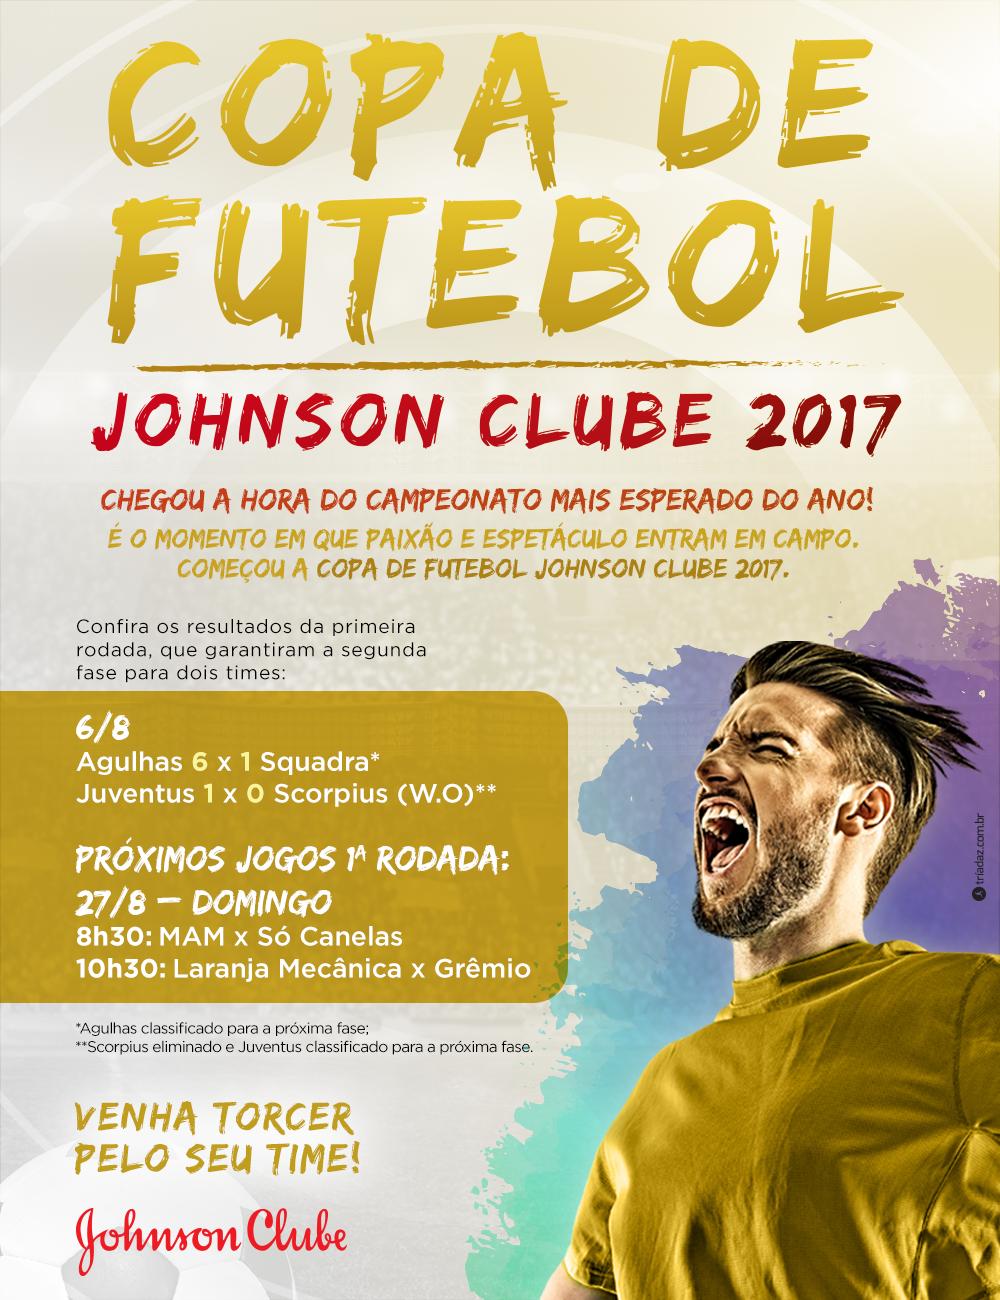 COMEÇOU A COPA DE FUTEBOL JOHNSON CLUBE 2017!